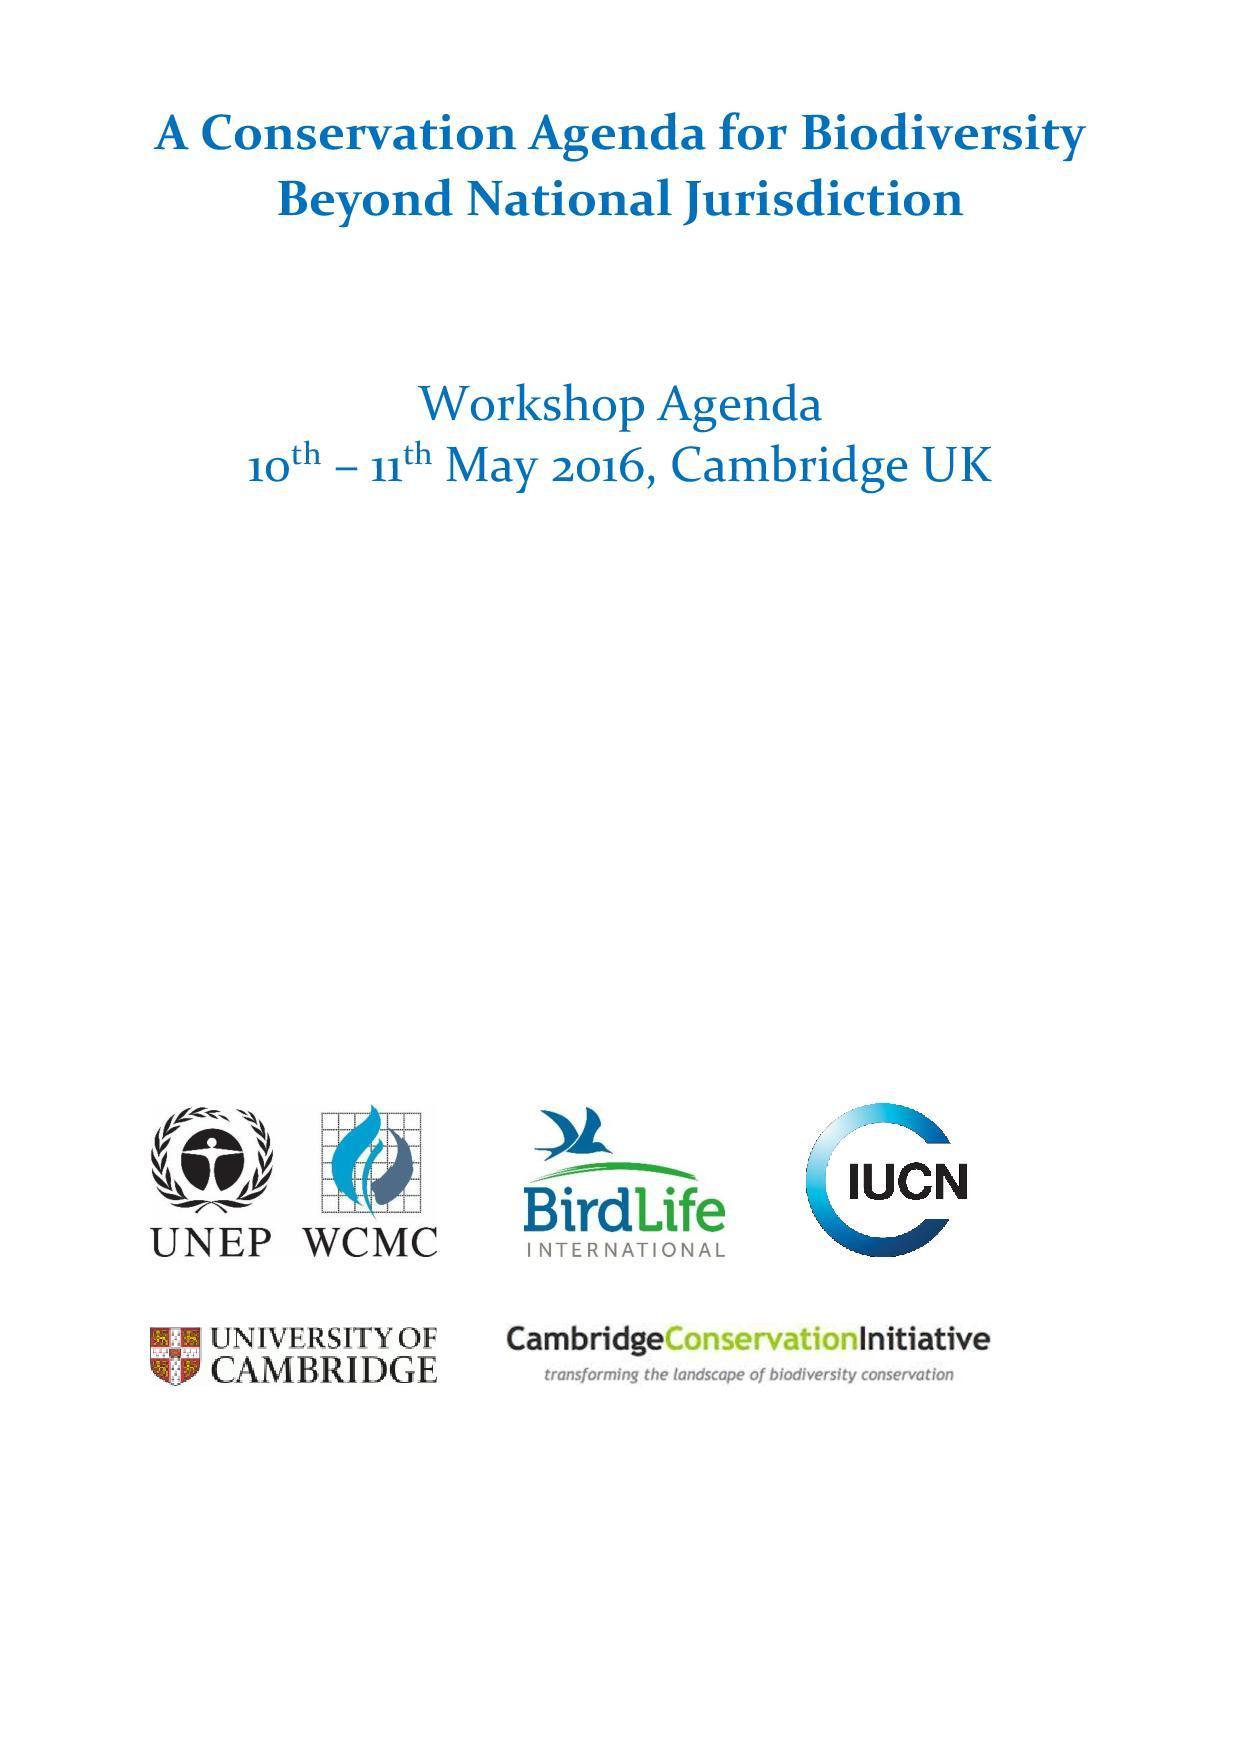 A Conservation Agenda for Biodiversity - Beyond National Jurisdiction